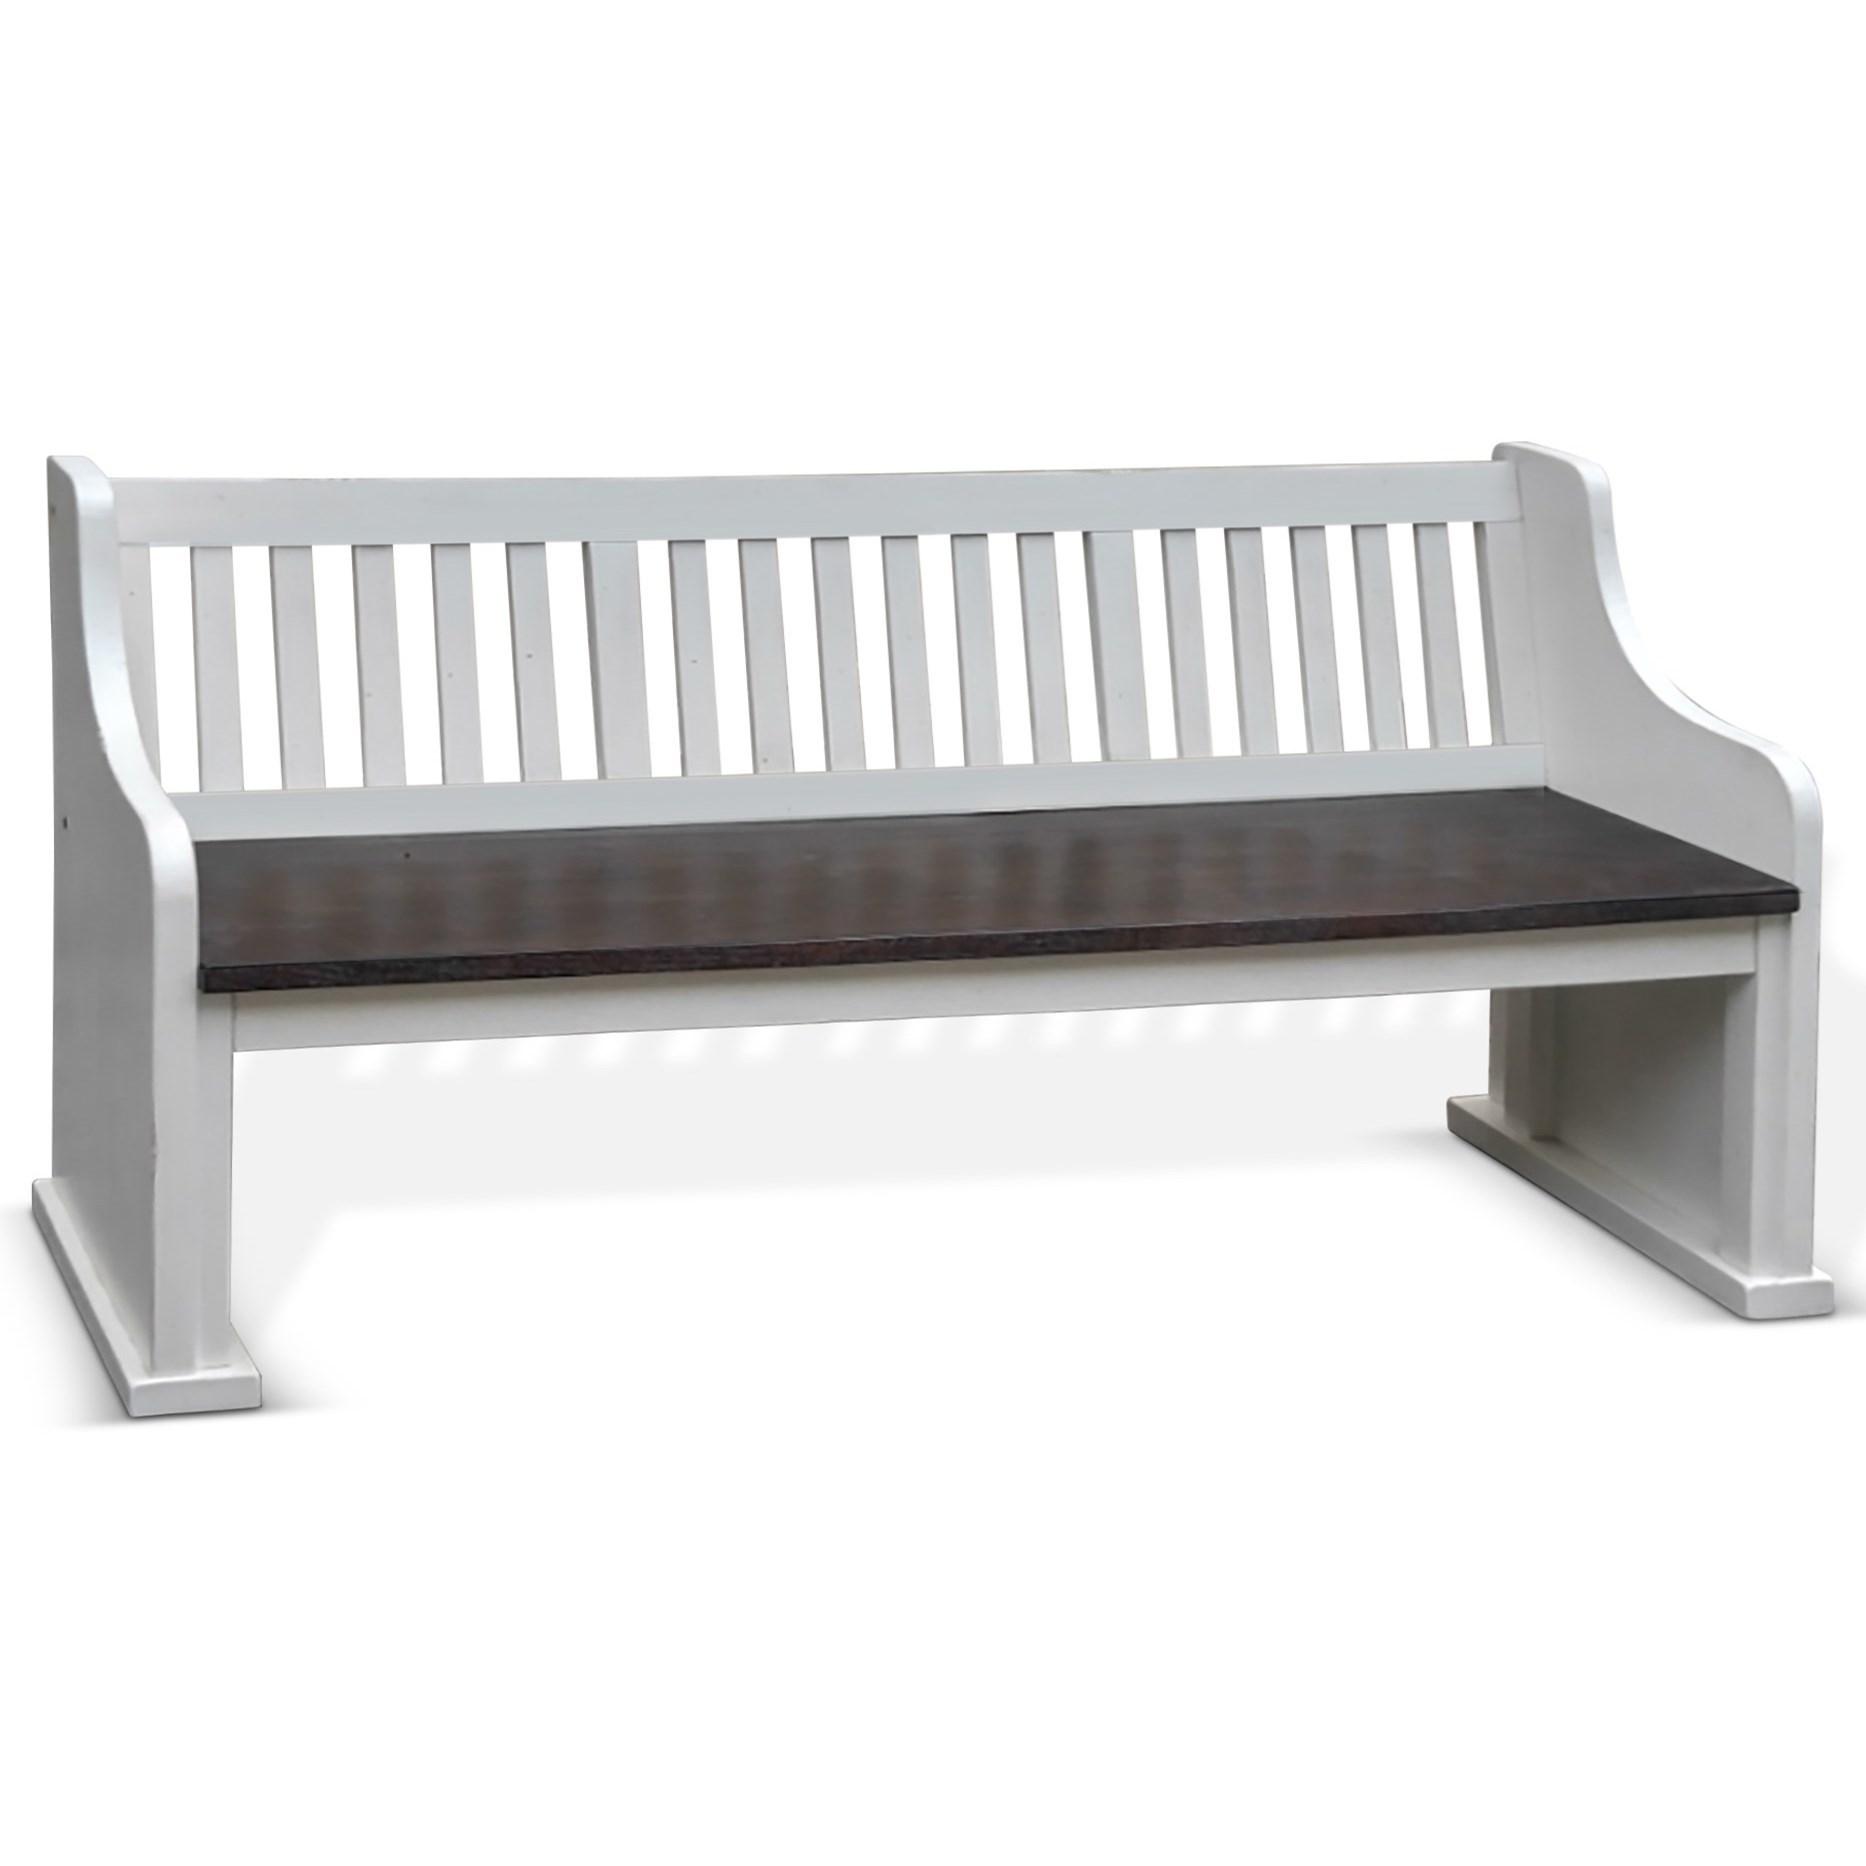 Bench w/ Back, Wood Seat